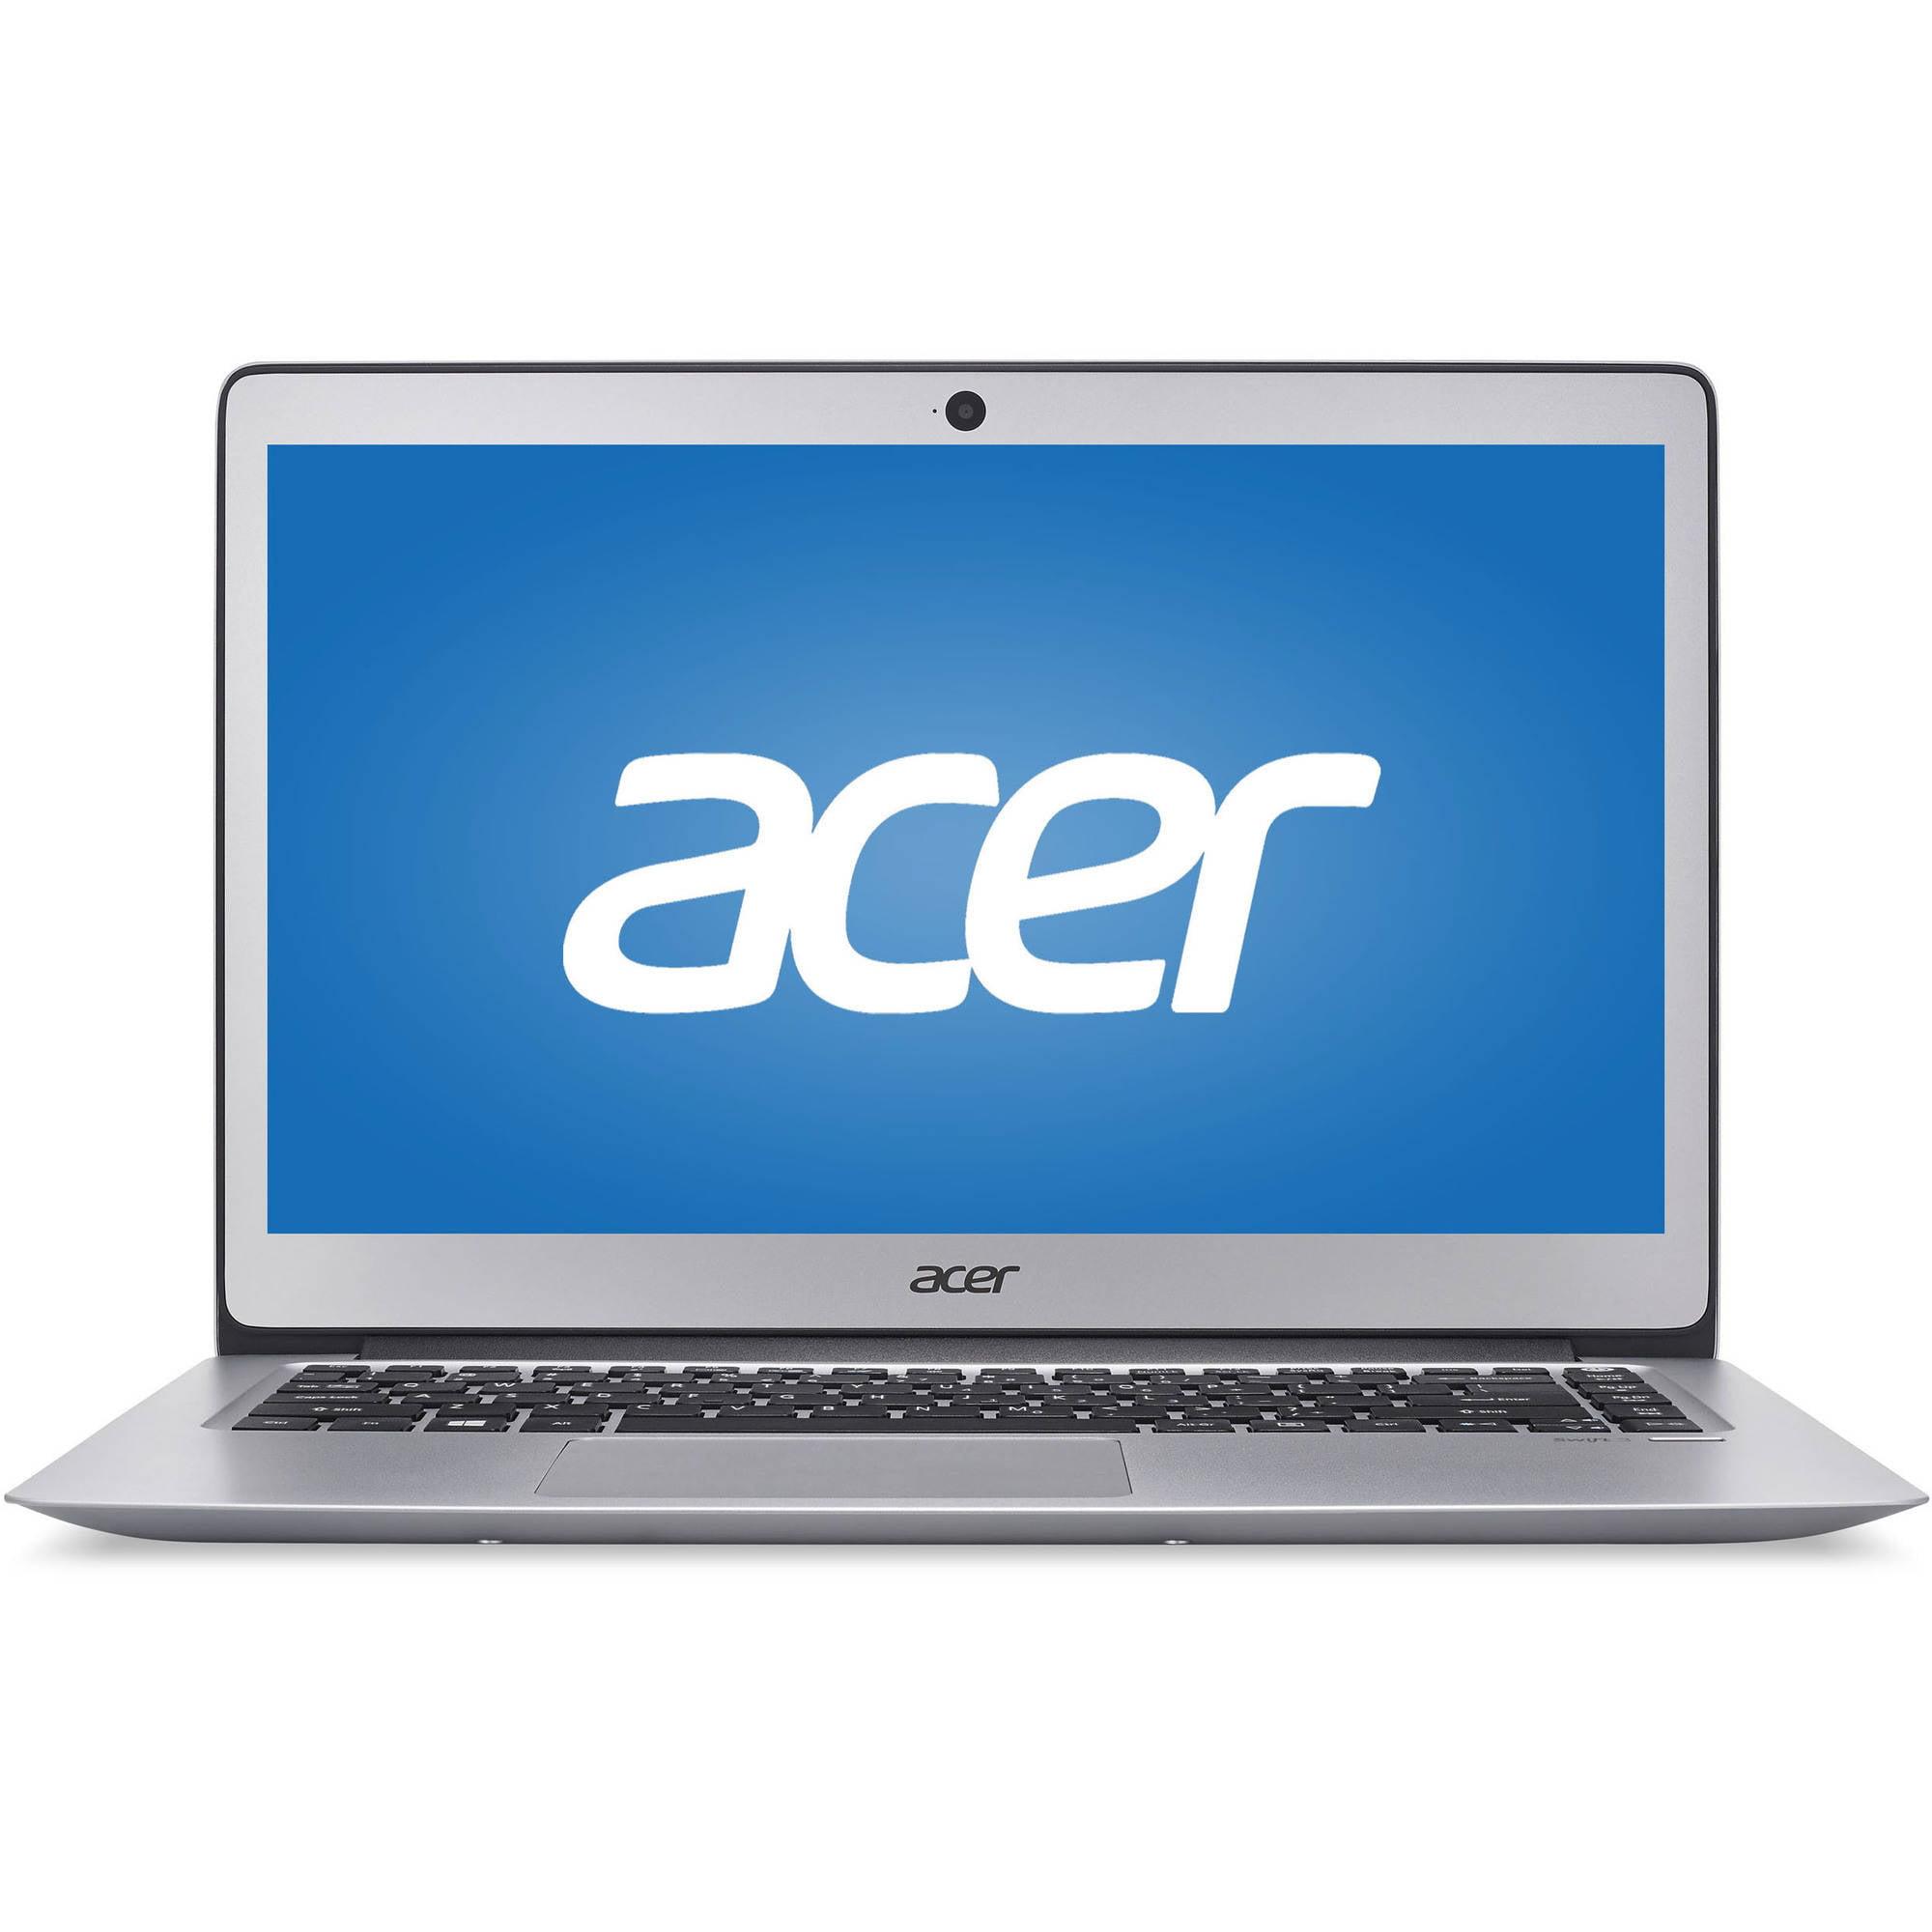 "Acer SF314-51-52W2 Swift 3 14"" Laptop, Windows 10, Intel Core i5-6200U Processor, 8GB RAM, 256GB Solid State Drive"